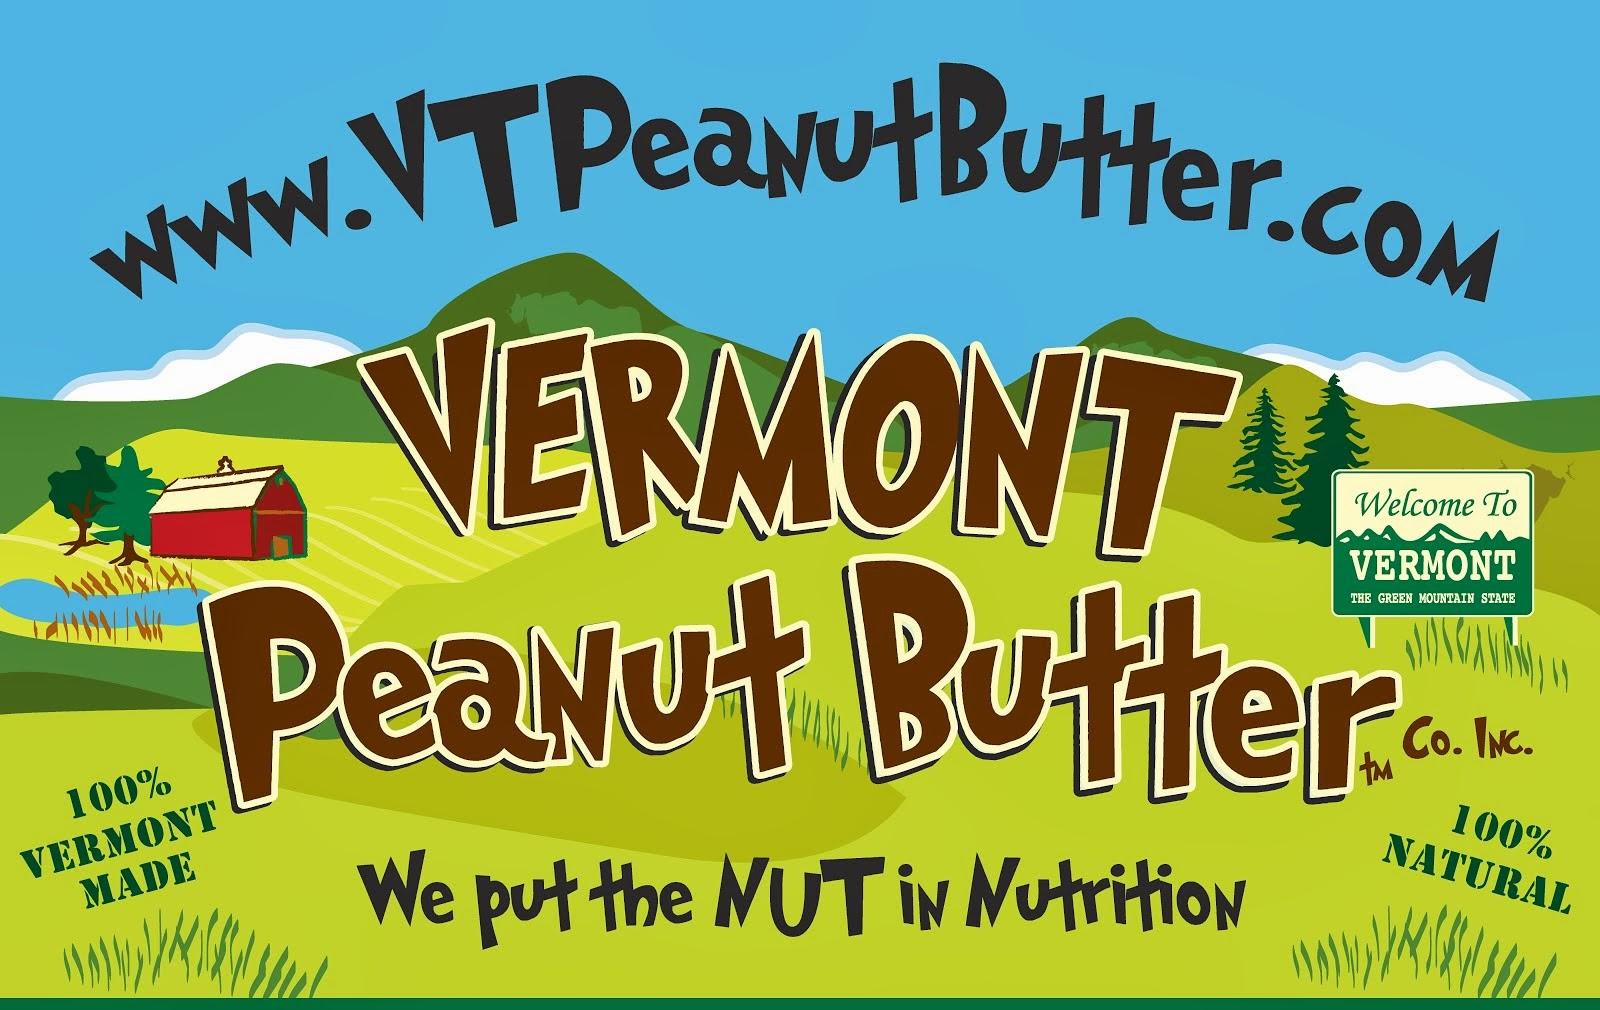 VT Peanut Butter